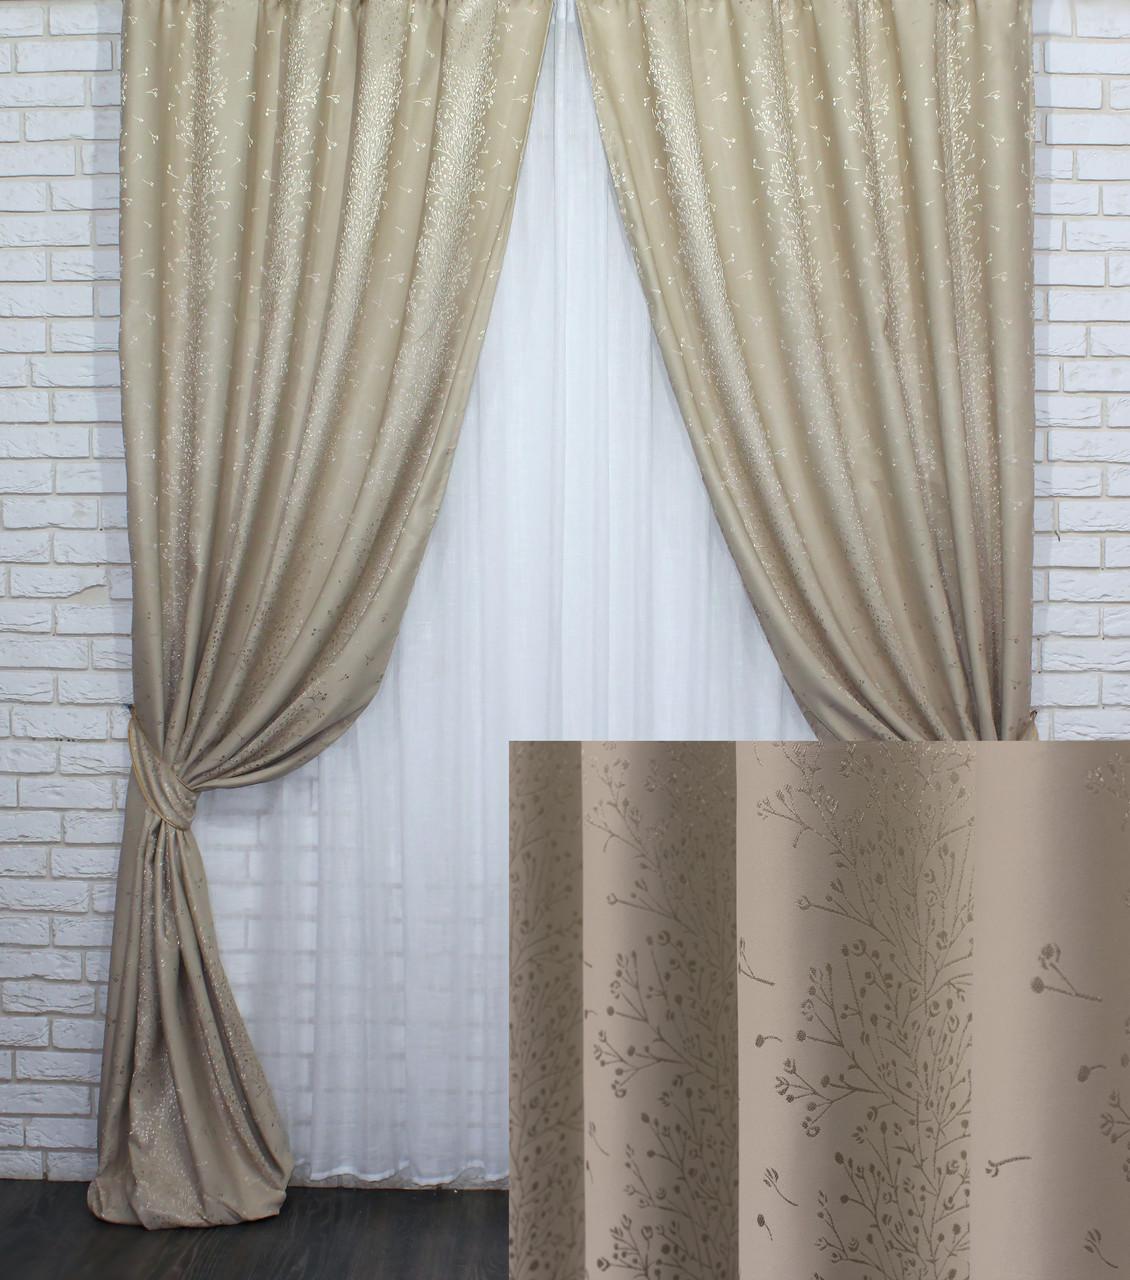 "Штори (2шт 1.5х2.7м) з тканини блекаут, колекція ""Сакура"", колір карамель. Код 681ш 30-458"